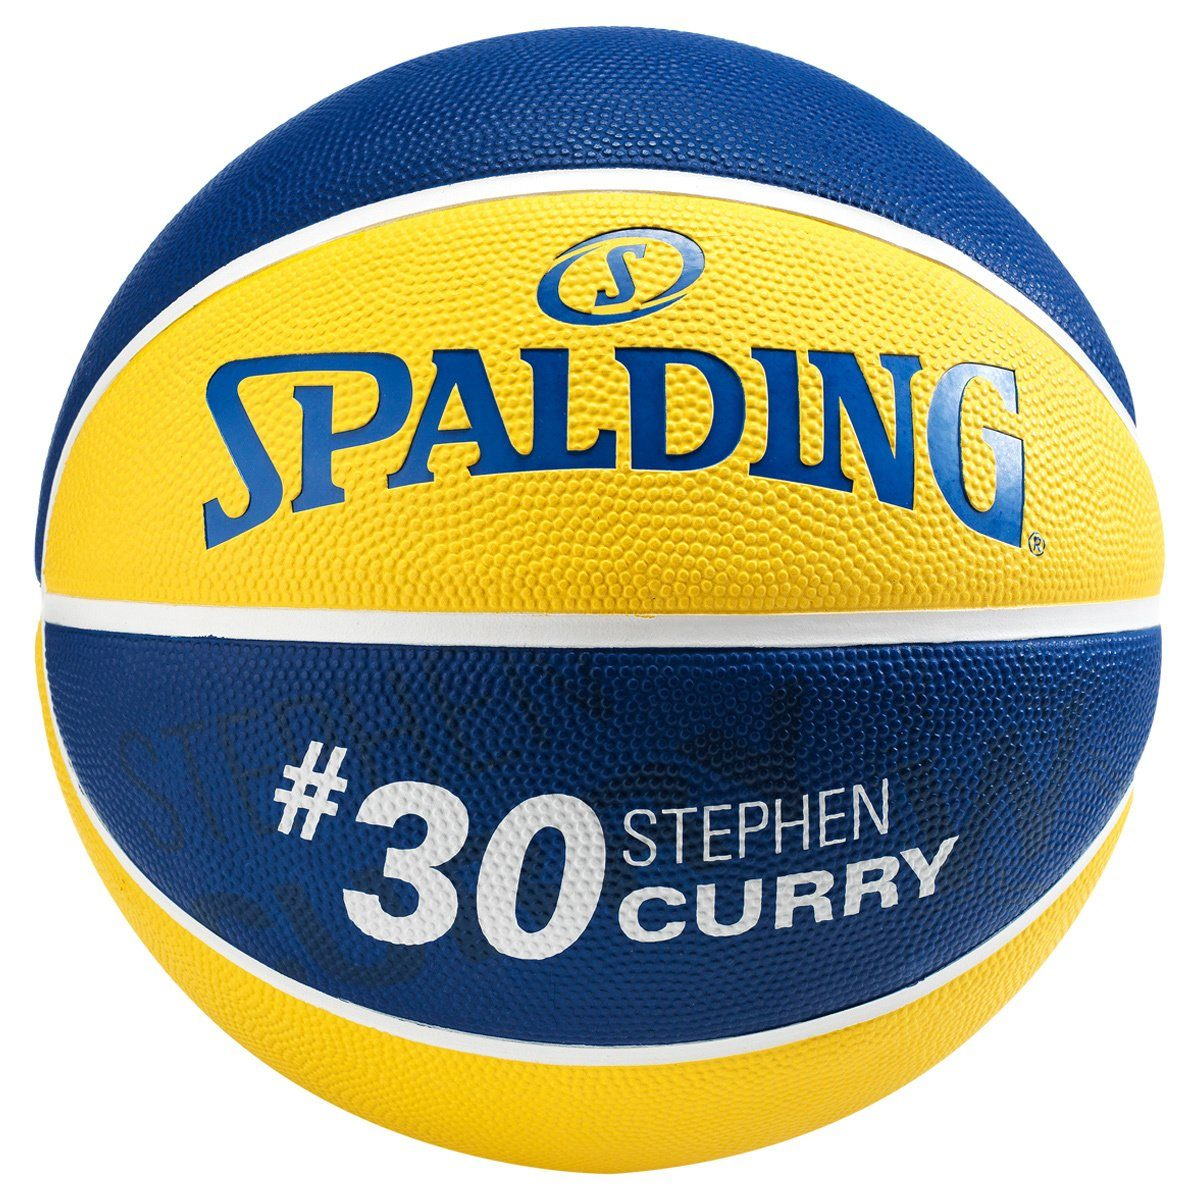 SPALDING NBA Player Stephen Curry Basketball